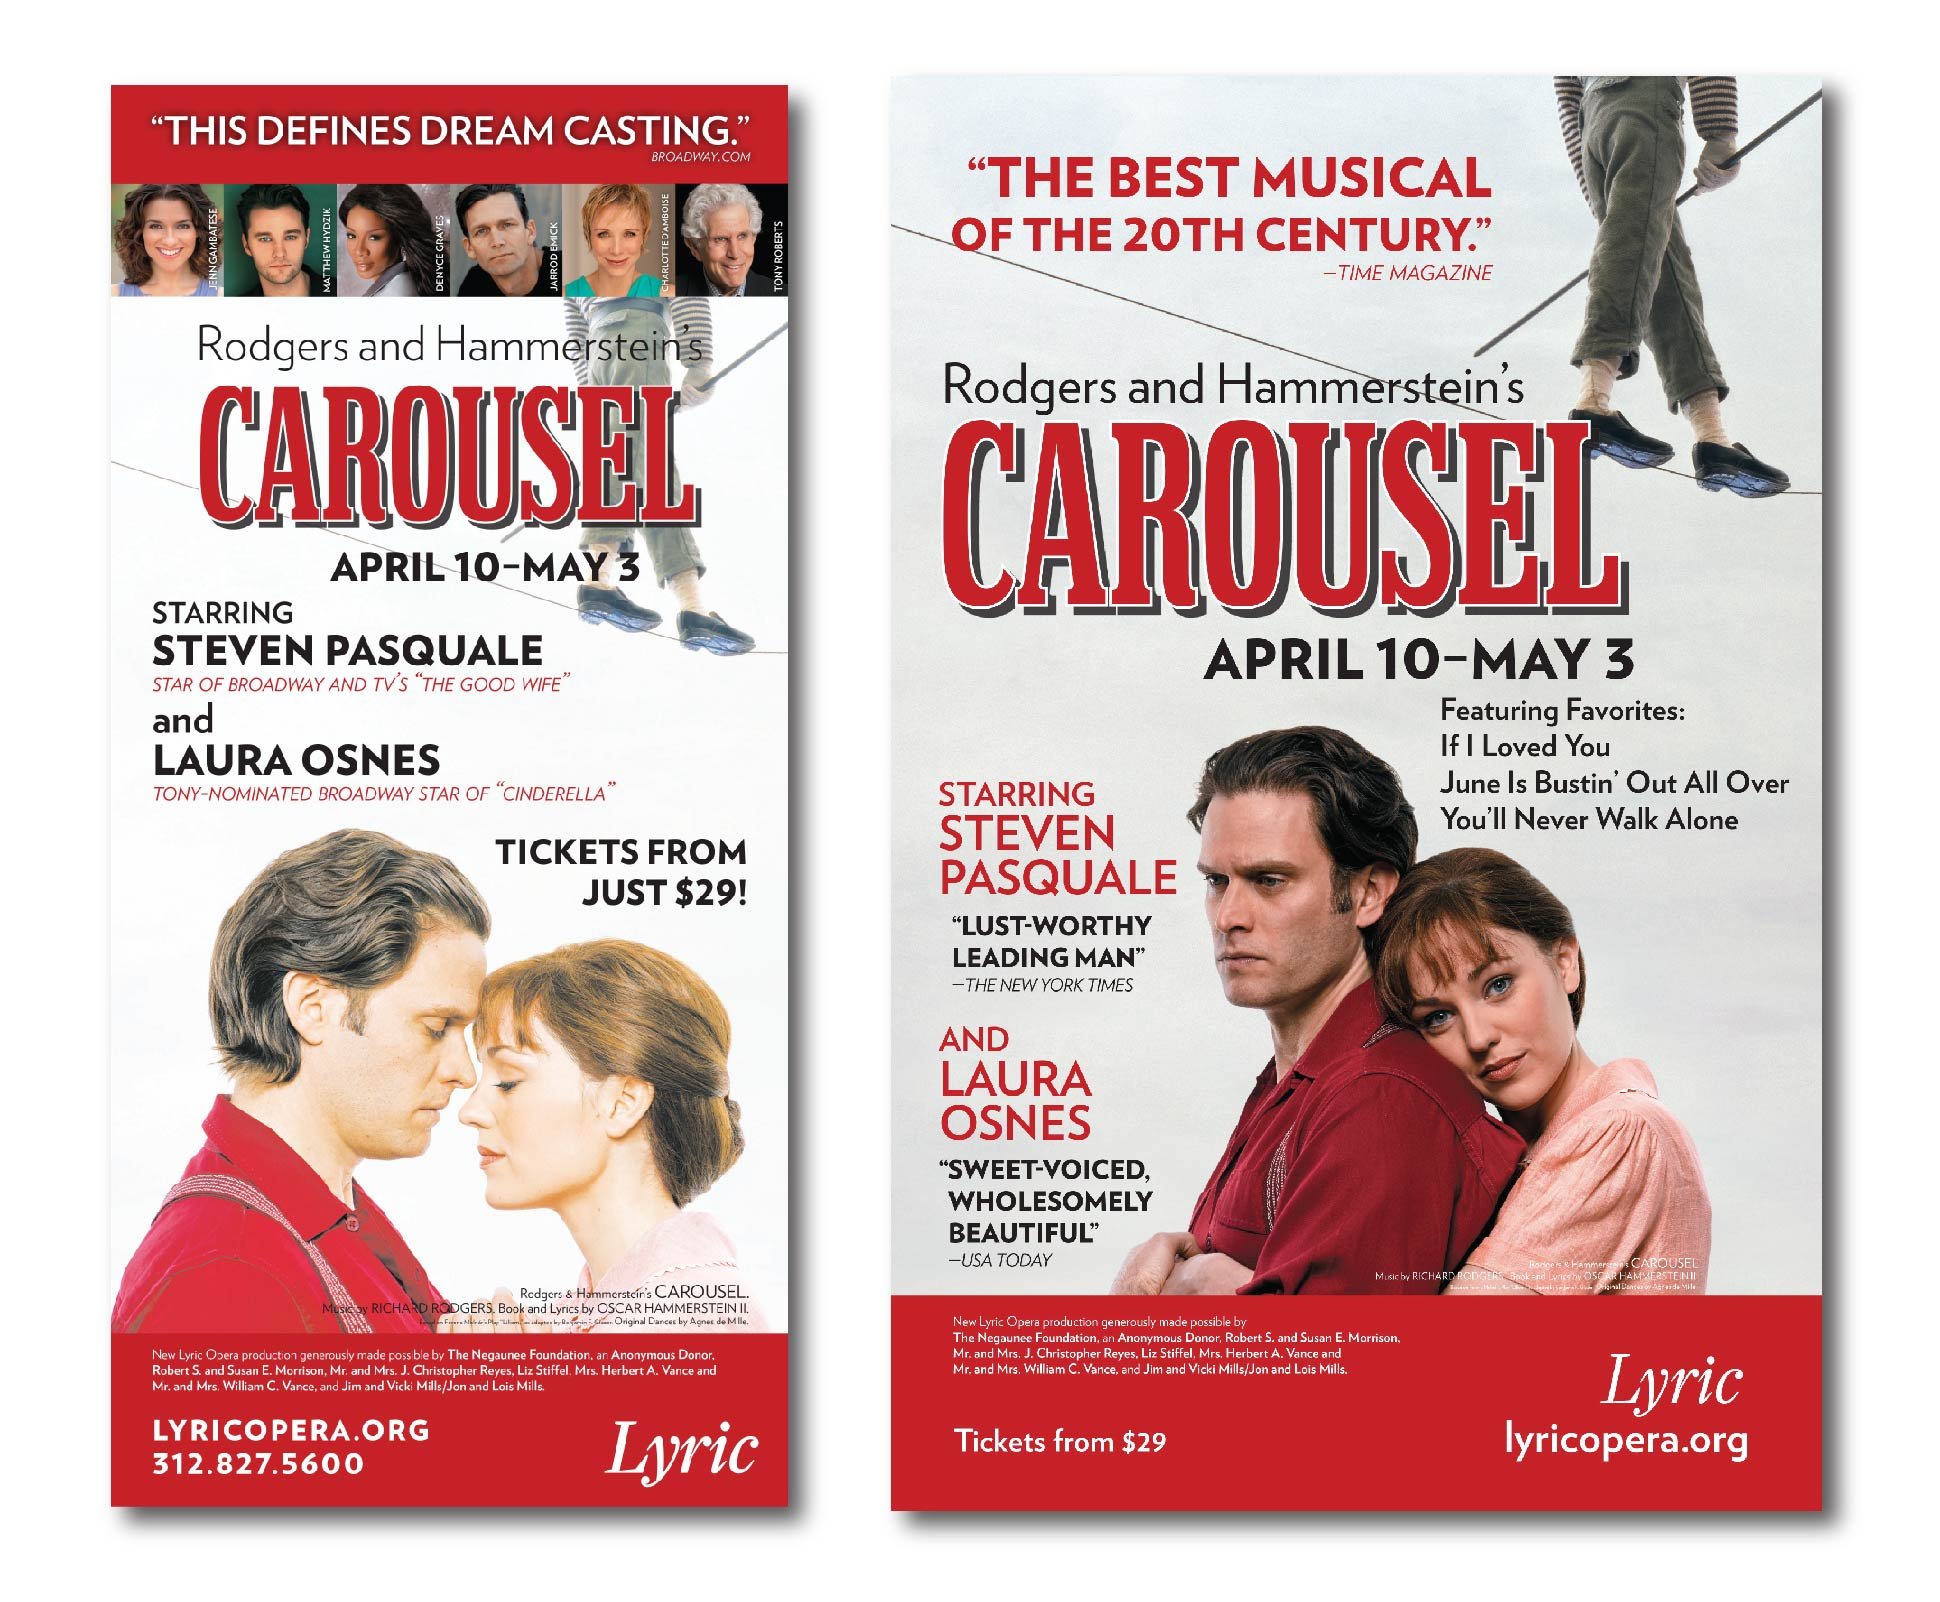 Carousel ads